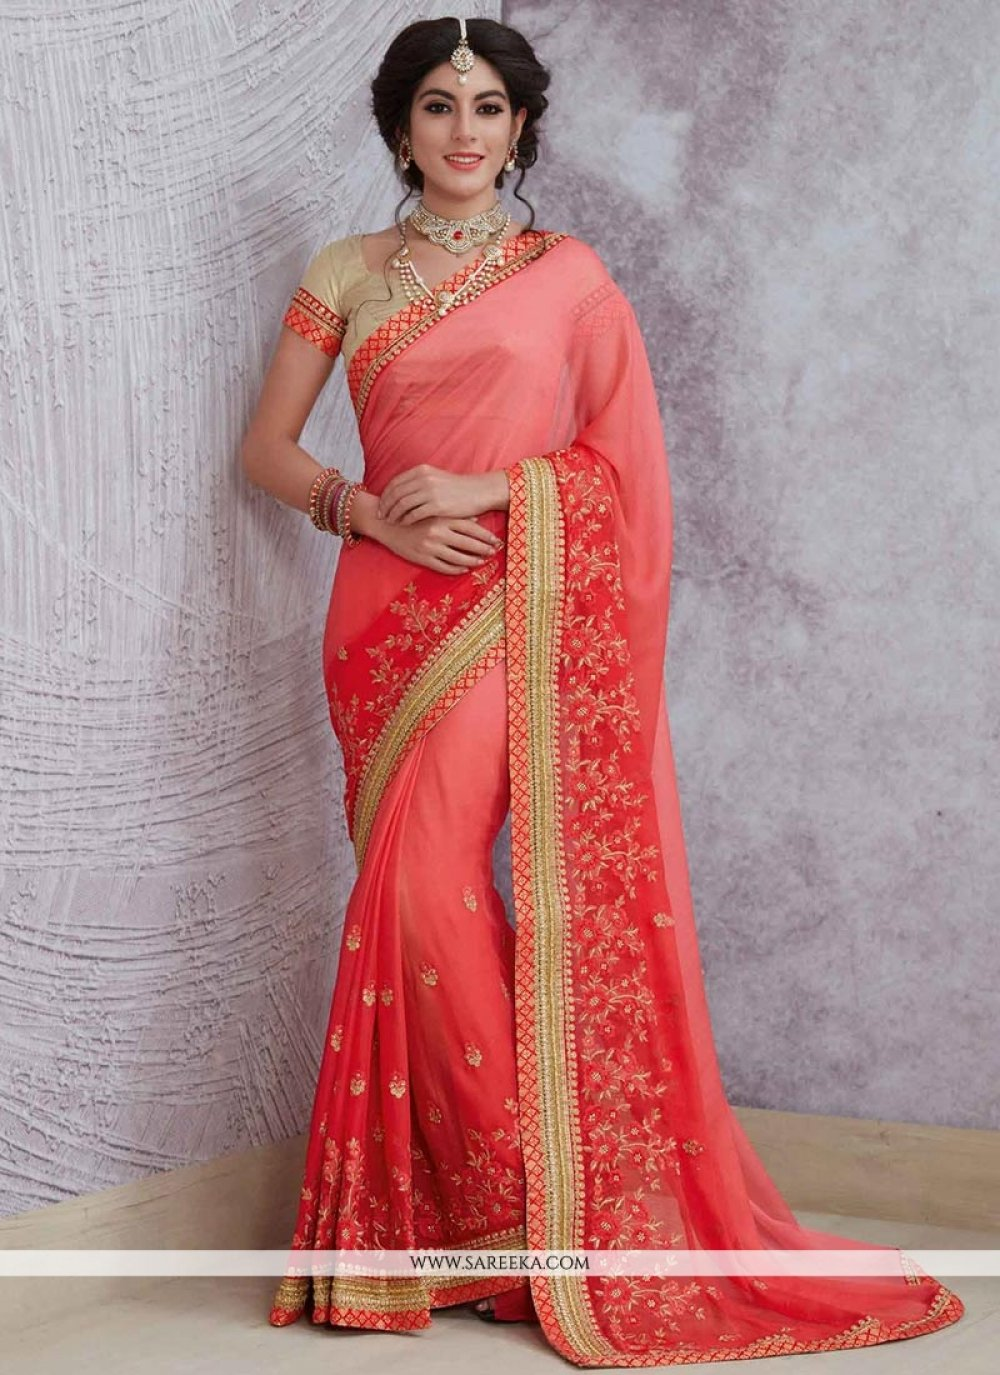 Satin Red and Rose Pink Shaded Saree